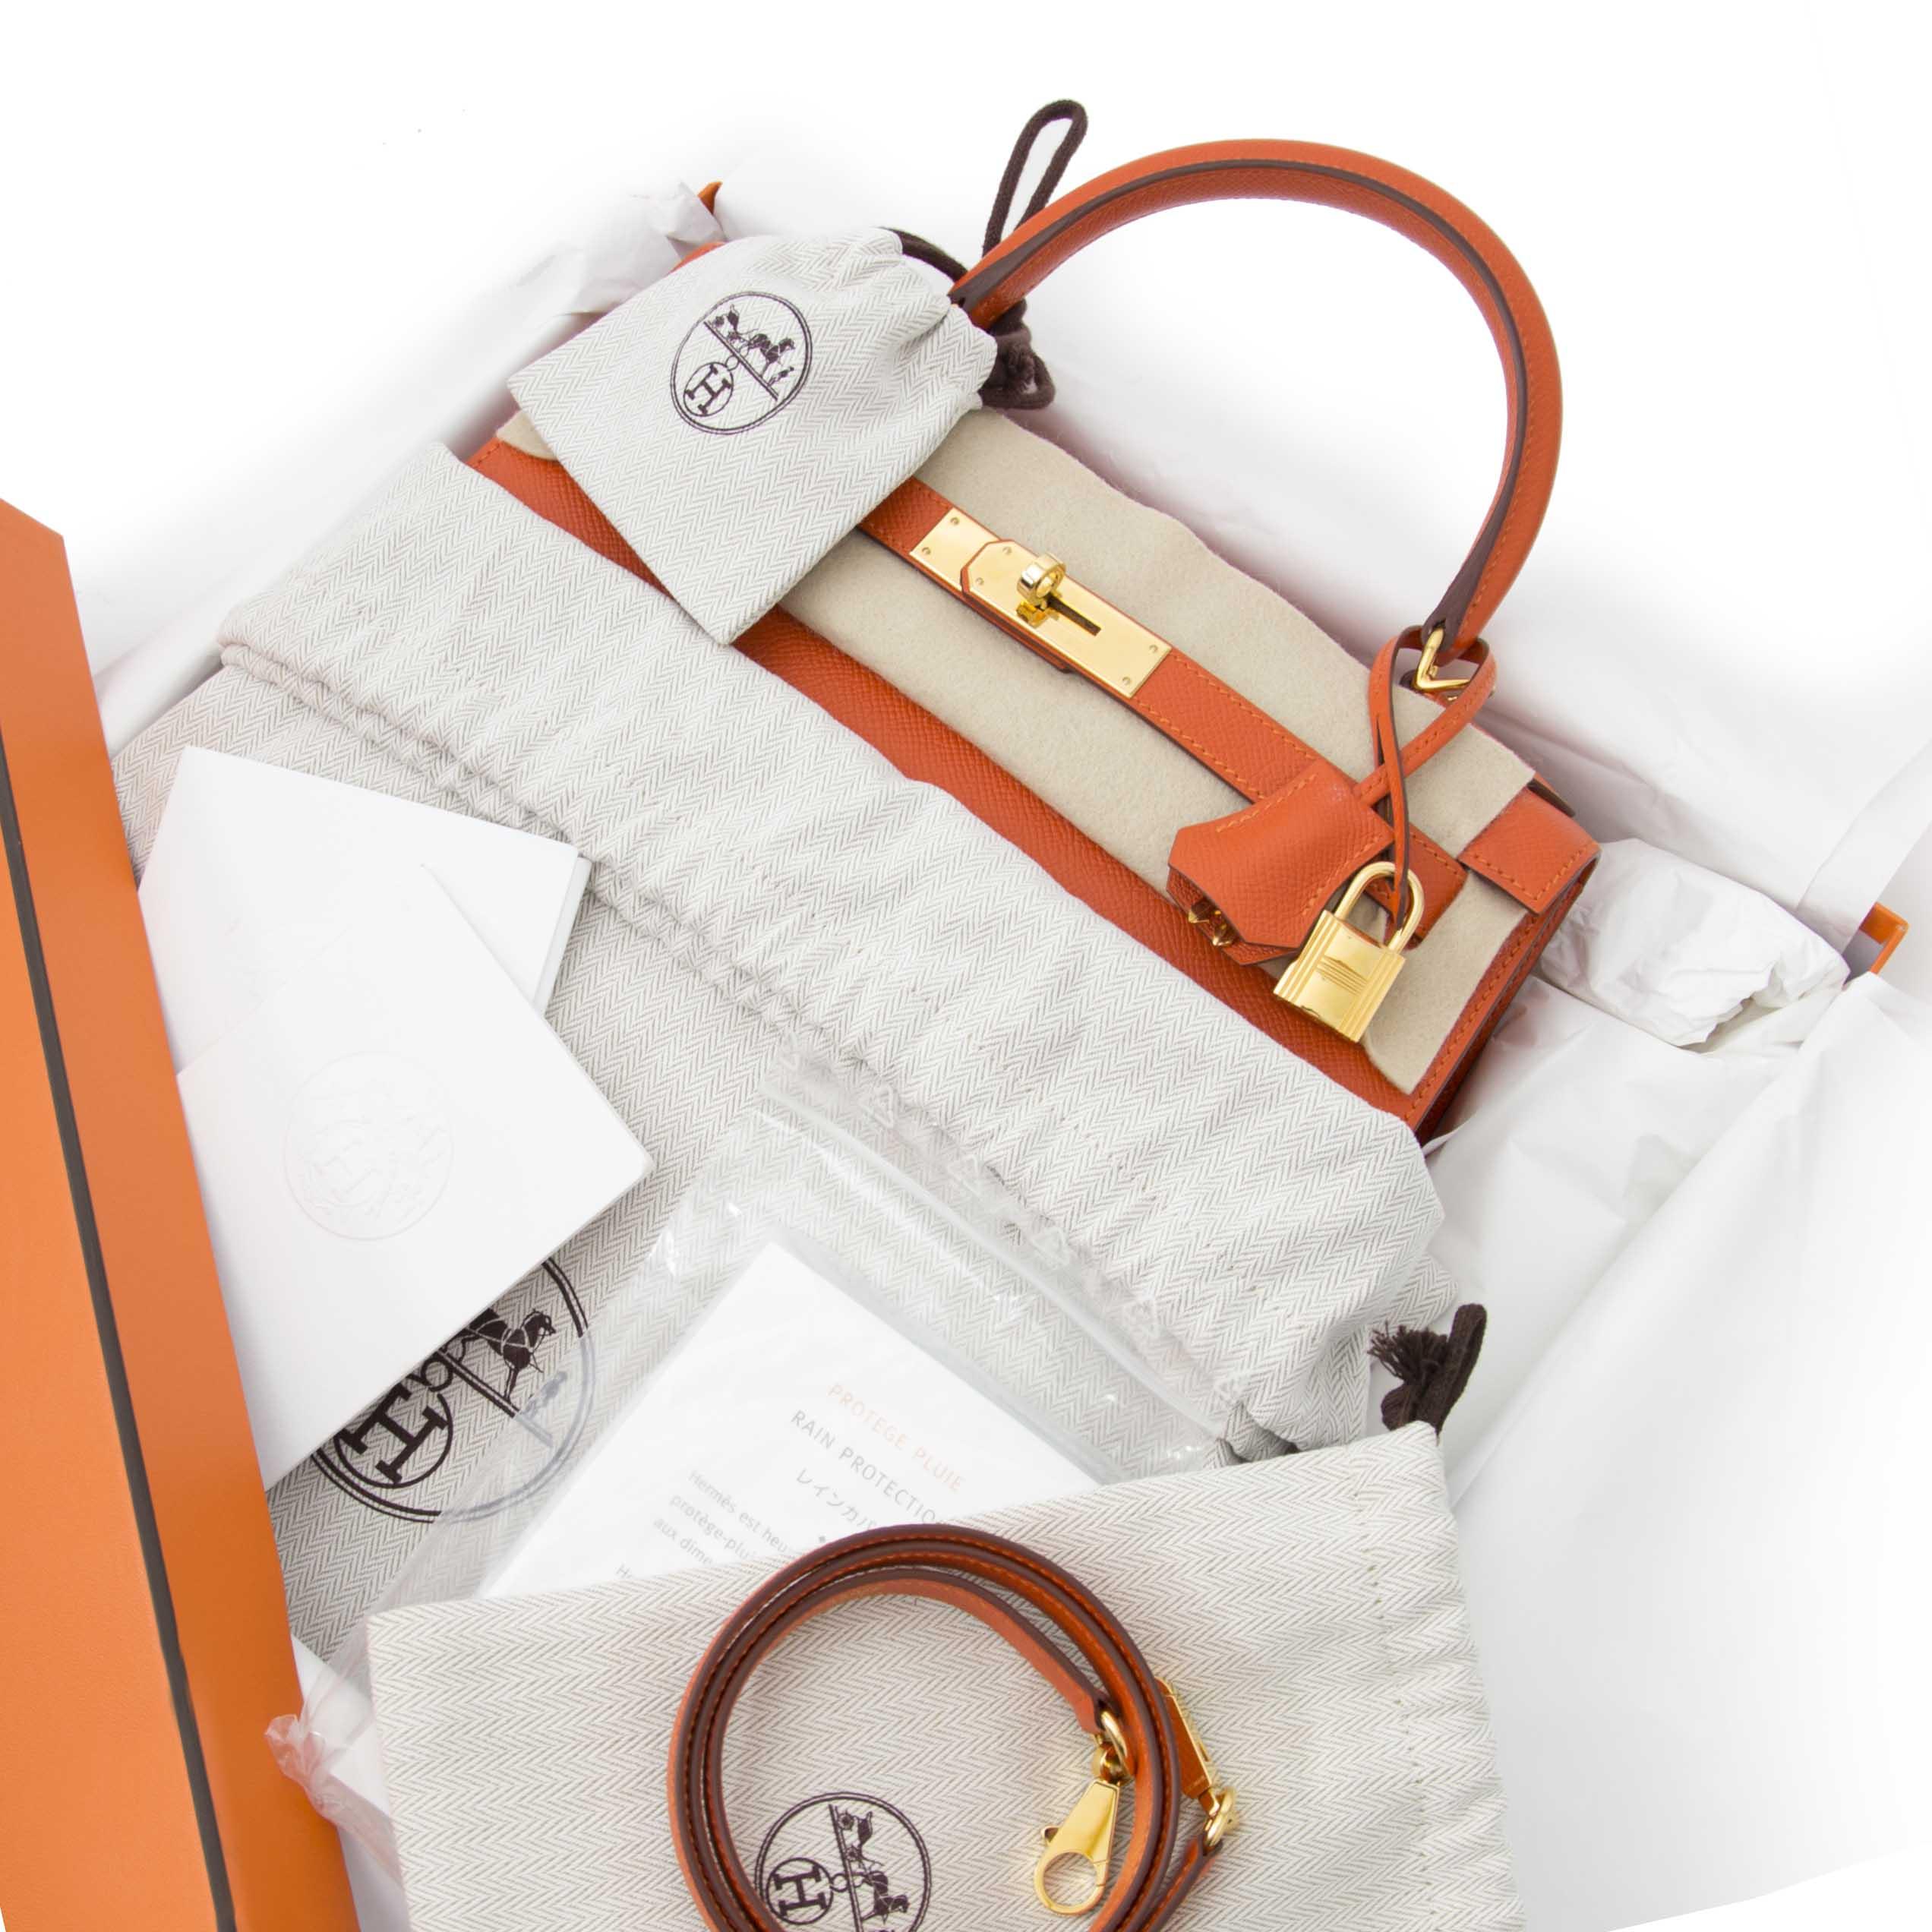 koop veilig online aan de beste prijs Hermes Kelly Sellier 28 Epsom Feu